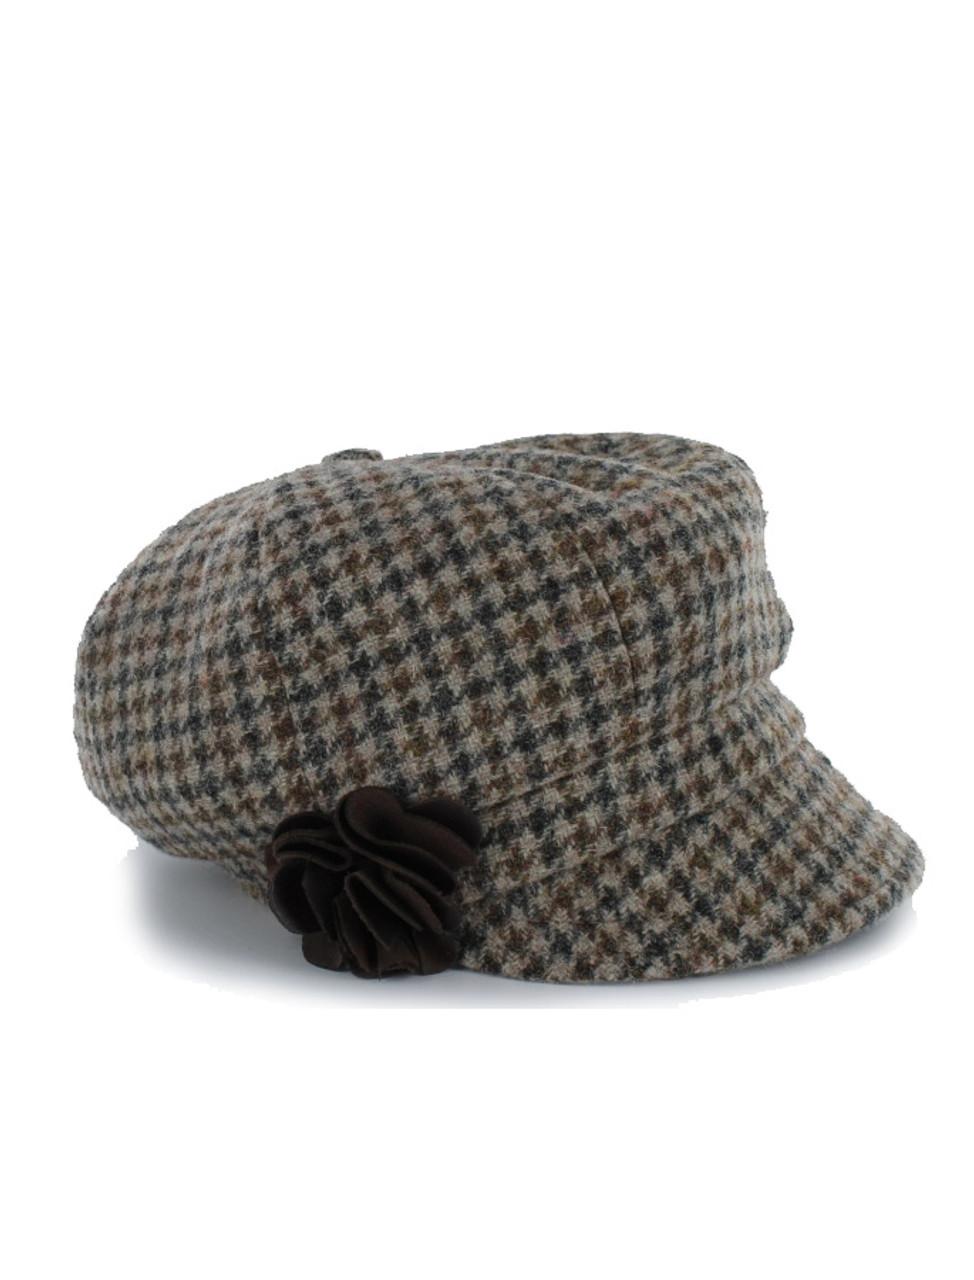 3c7d76e7ad0464 Vintage newsboy cap, Irish Wool Hats in Beige check | Clanarans